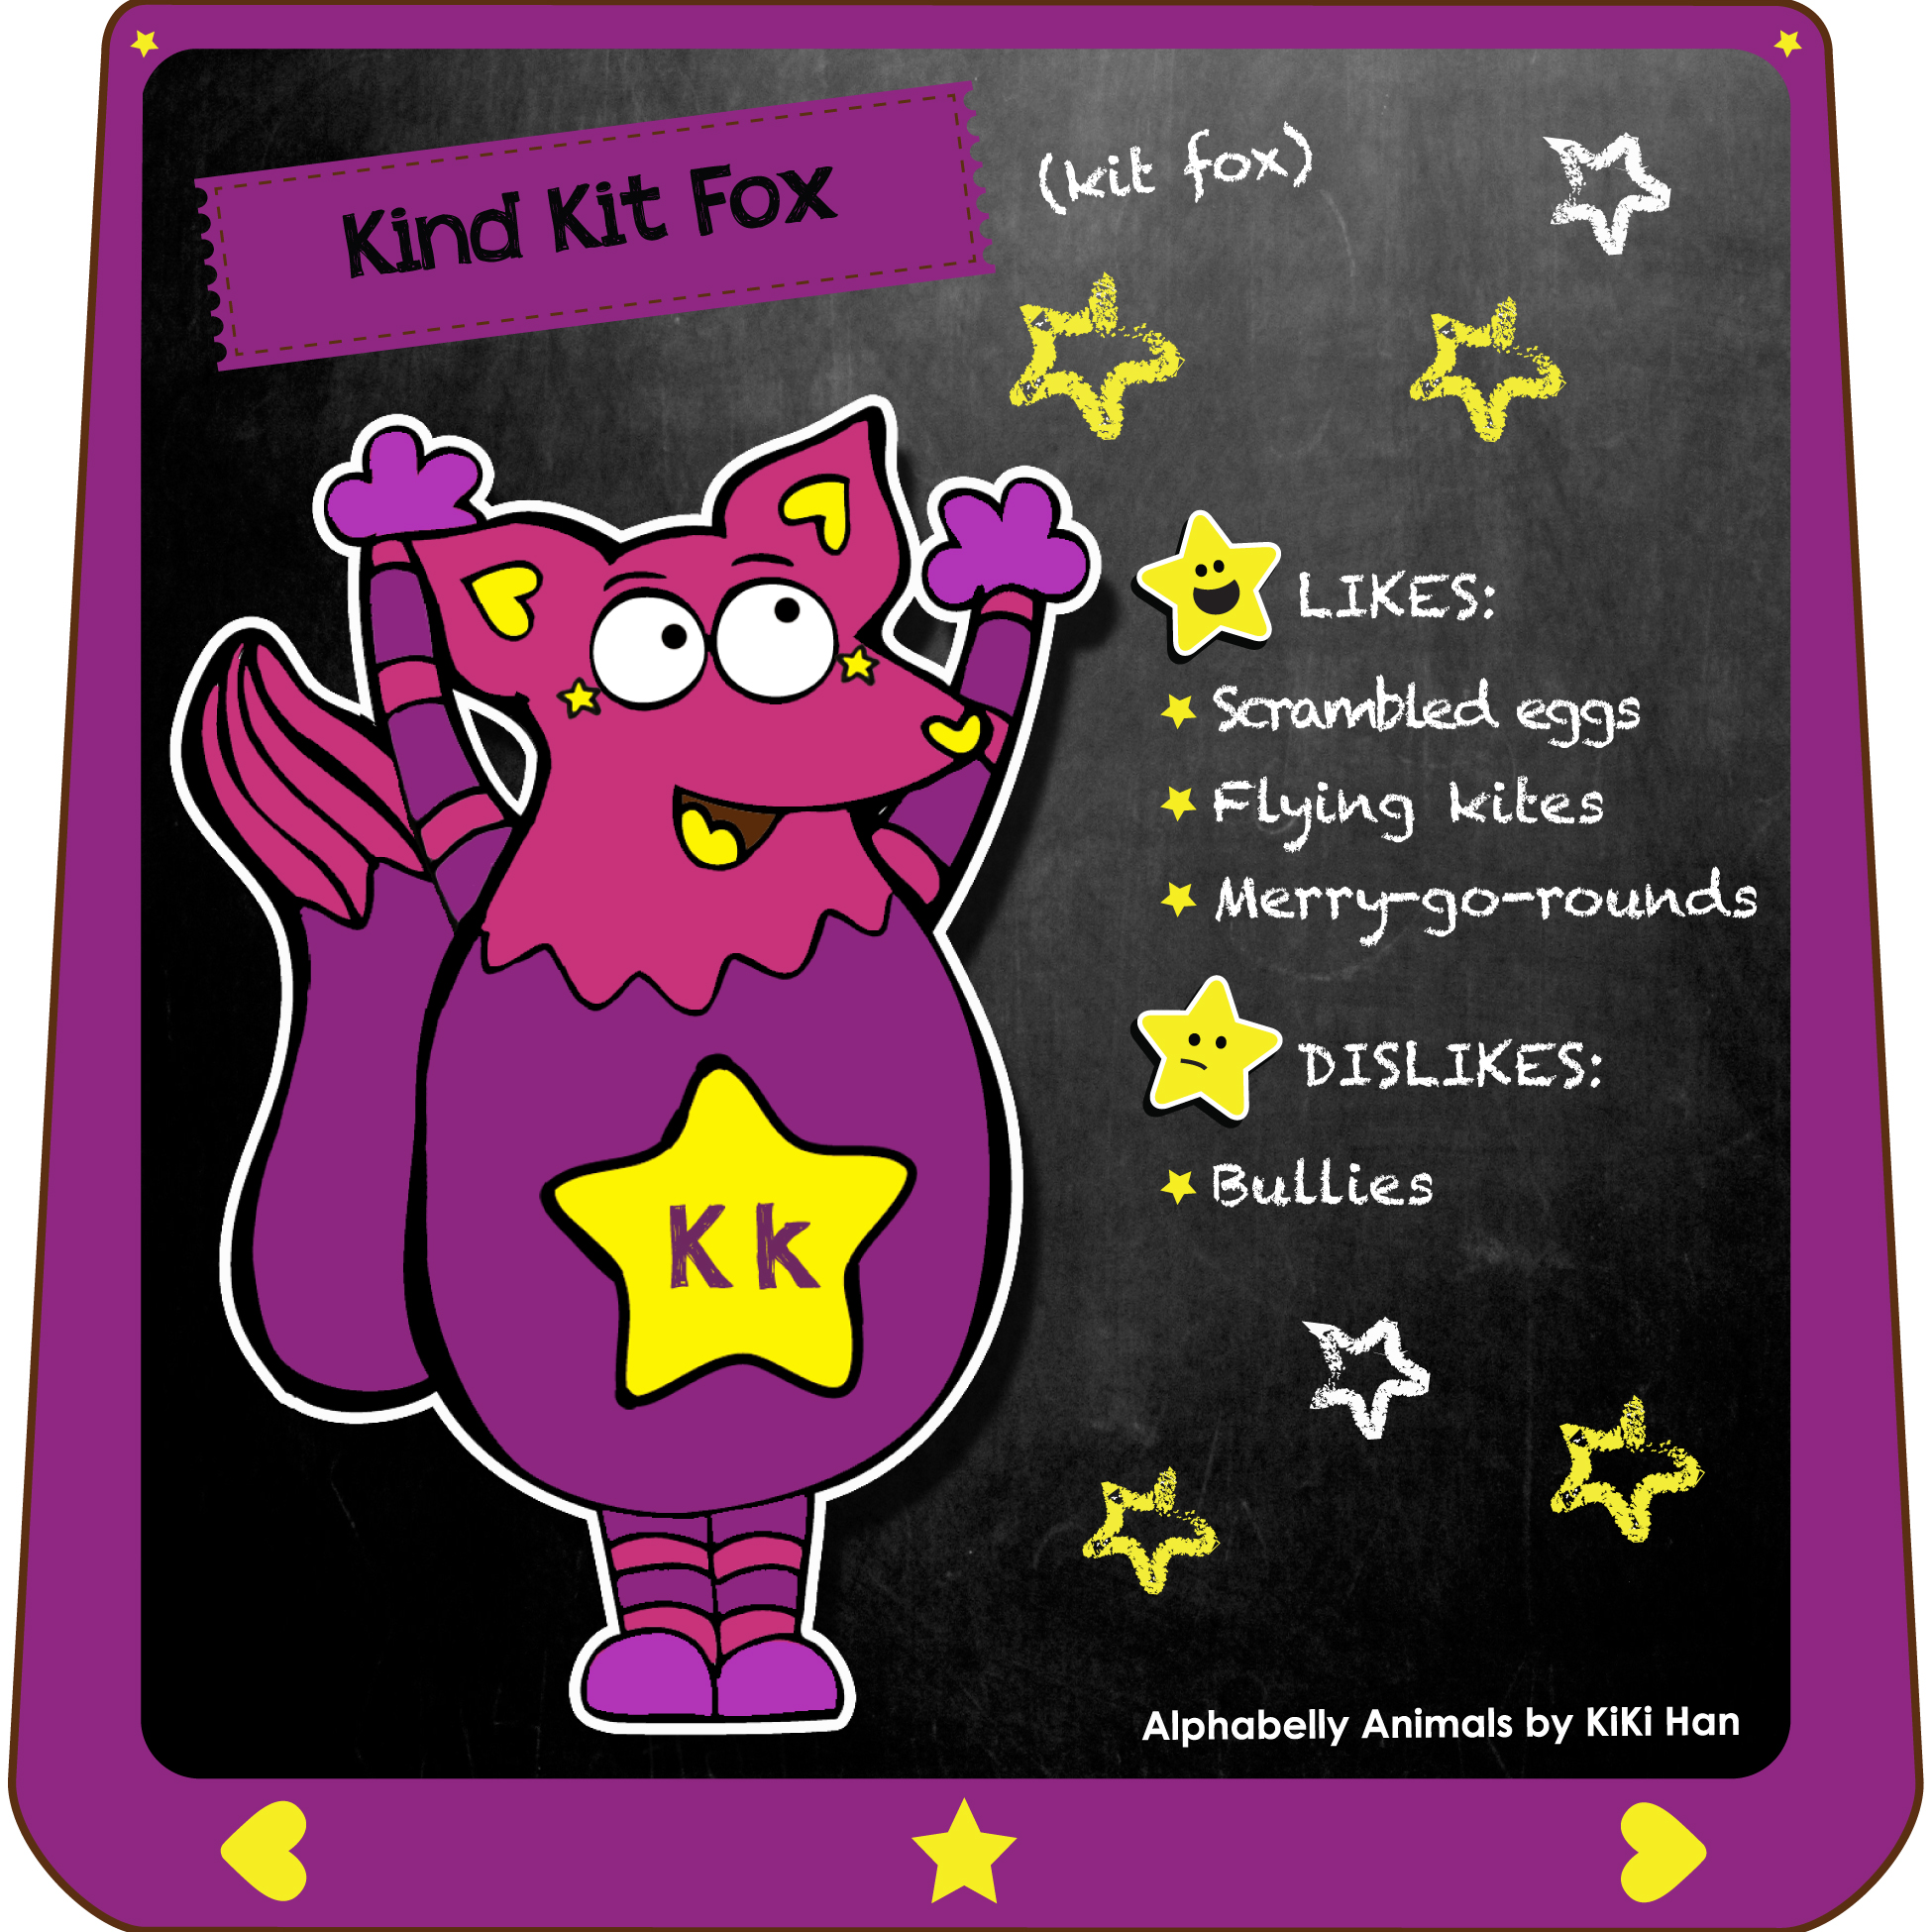 Kit Fox I KiKi Han I KiKiHan I GeekyKiKi I Geeky KiKi I Missgeekykiki I Cutiecons I Cutiecon I Cutie Con I Alphabellies I Alphabelly I A to Z Animal Poster